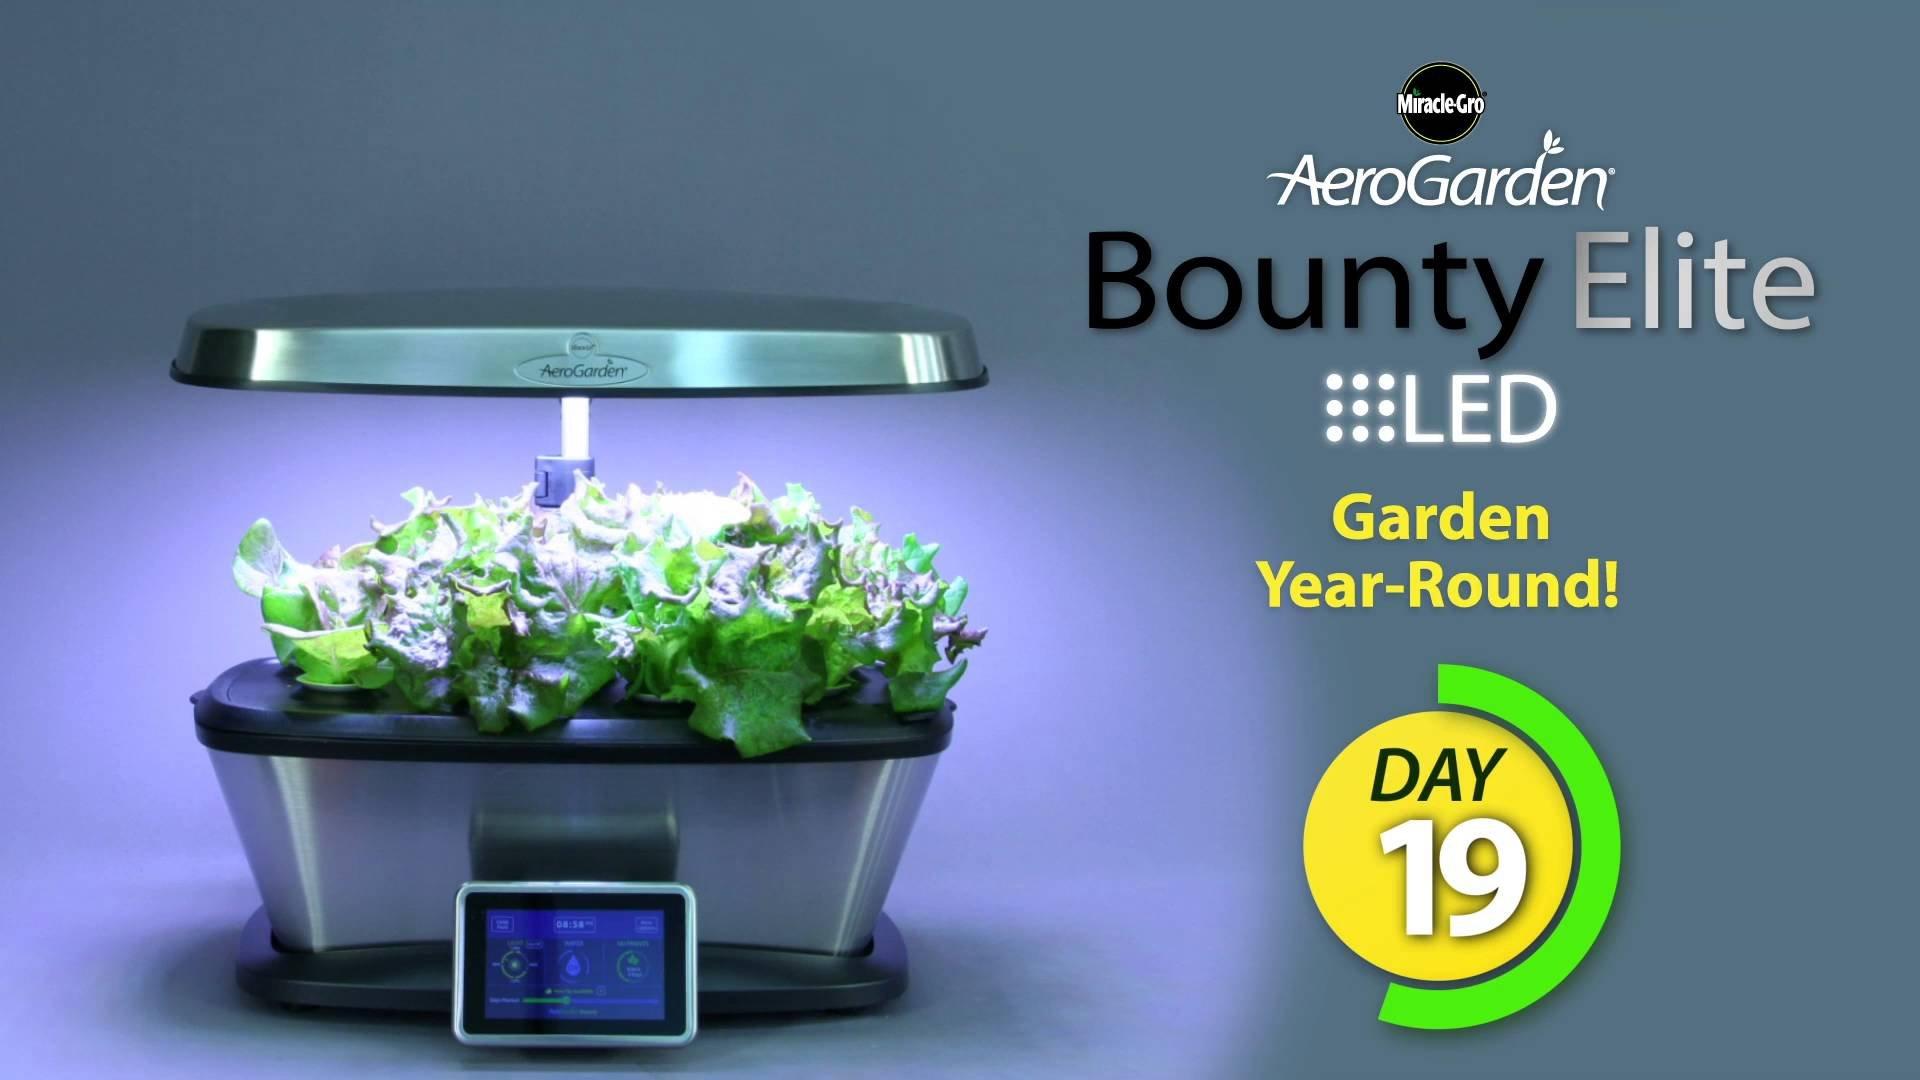 Aerogarden Bounty Elite Wi-Fi Stainless Steel Indoor Garden with Cherry Tomato Kit by AeroGrow (Image #8)